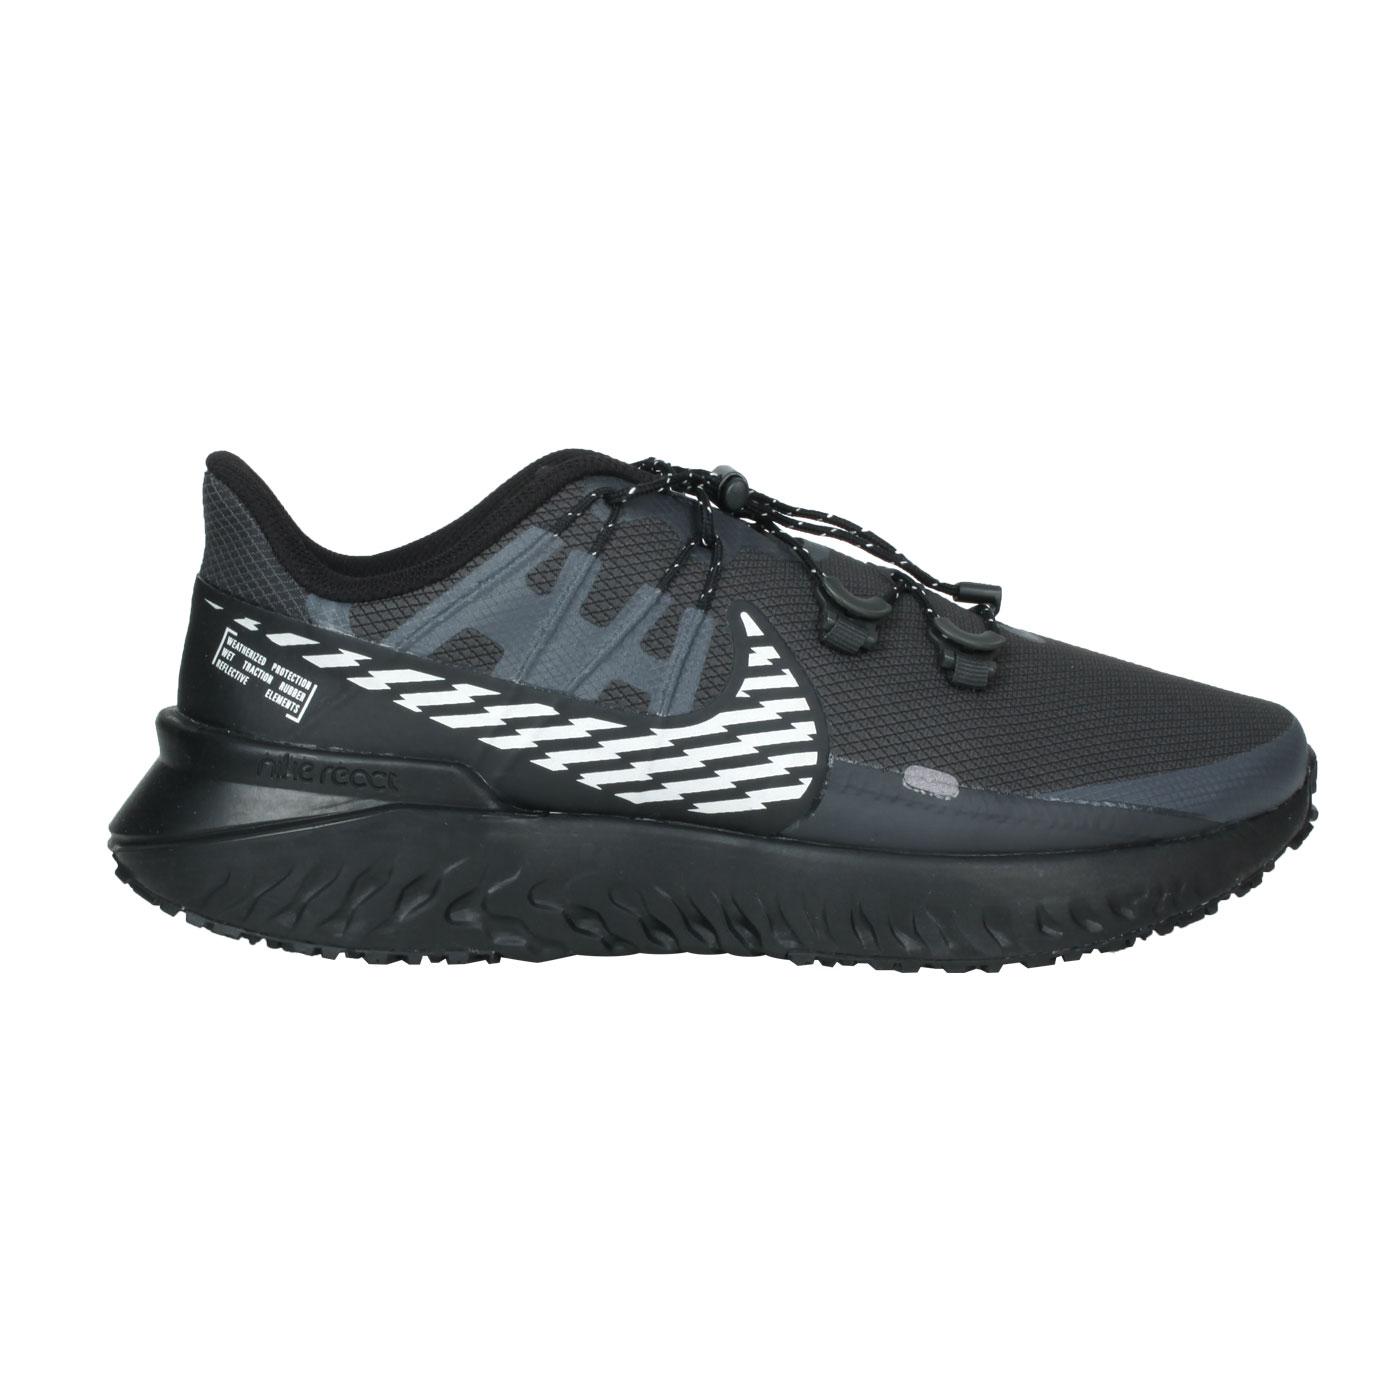 NIKE 男款休閒運動鞋  @LEGEND REACT 3 SHIELD@CU3864002